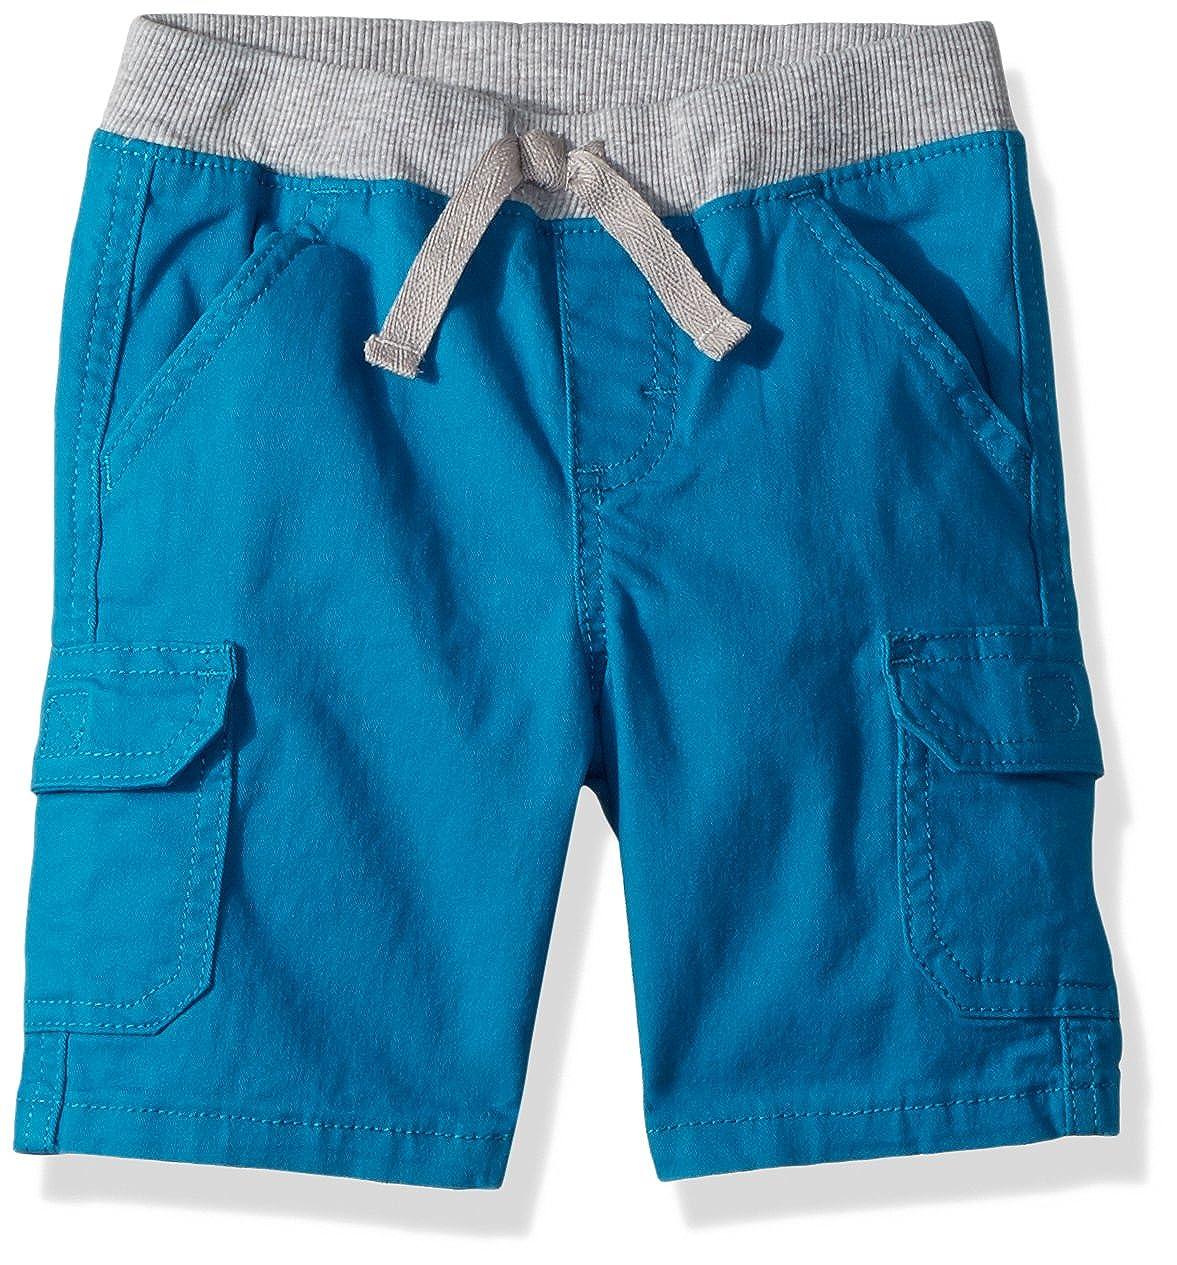 Wrangler Authentics Toddler Boys Knit Waist Short P000556723